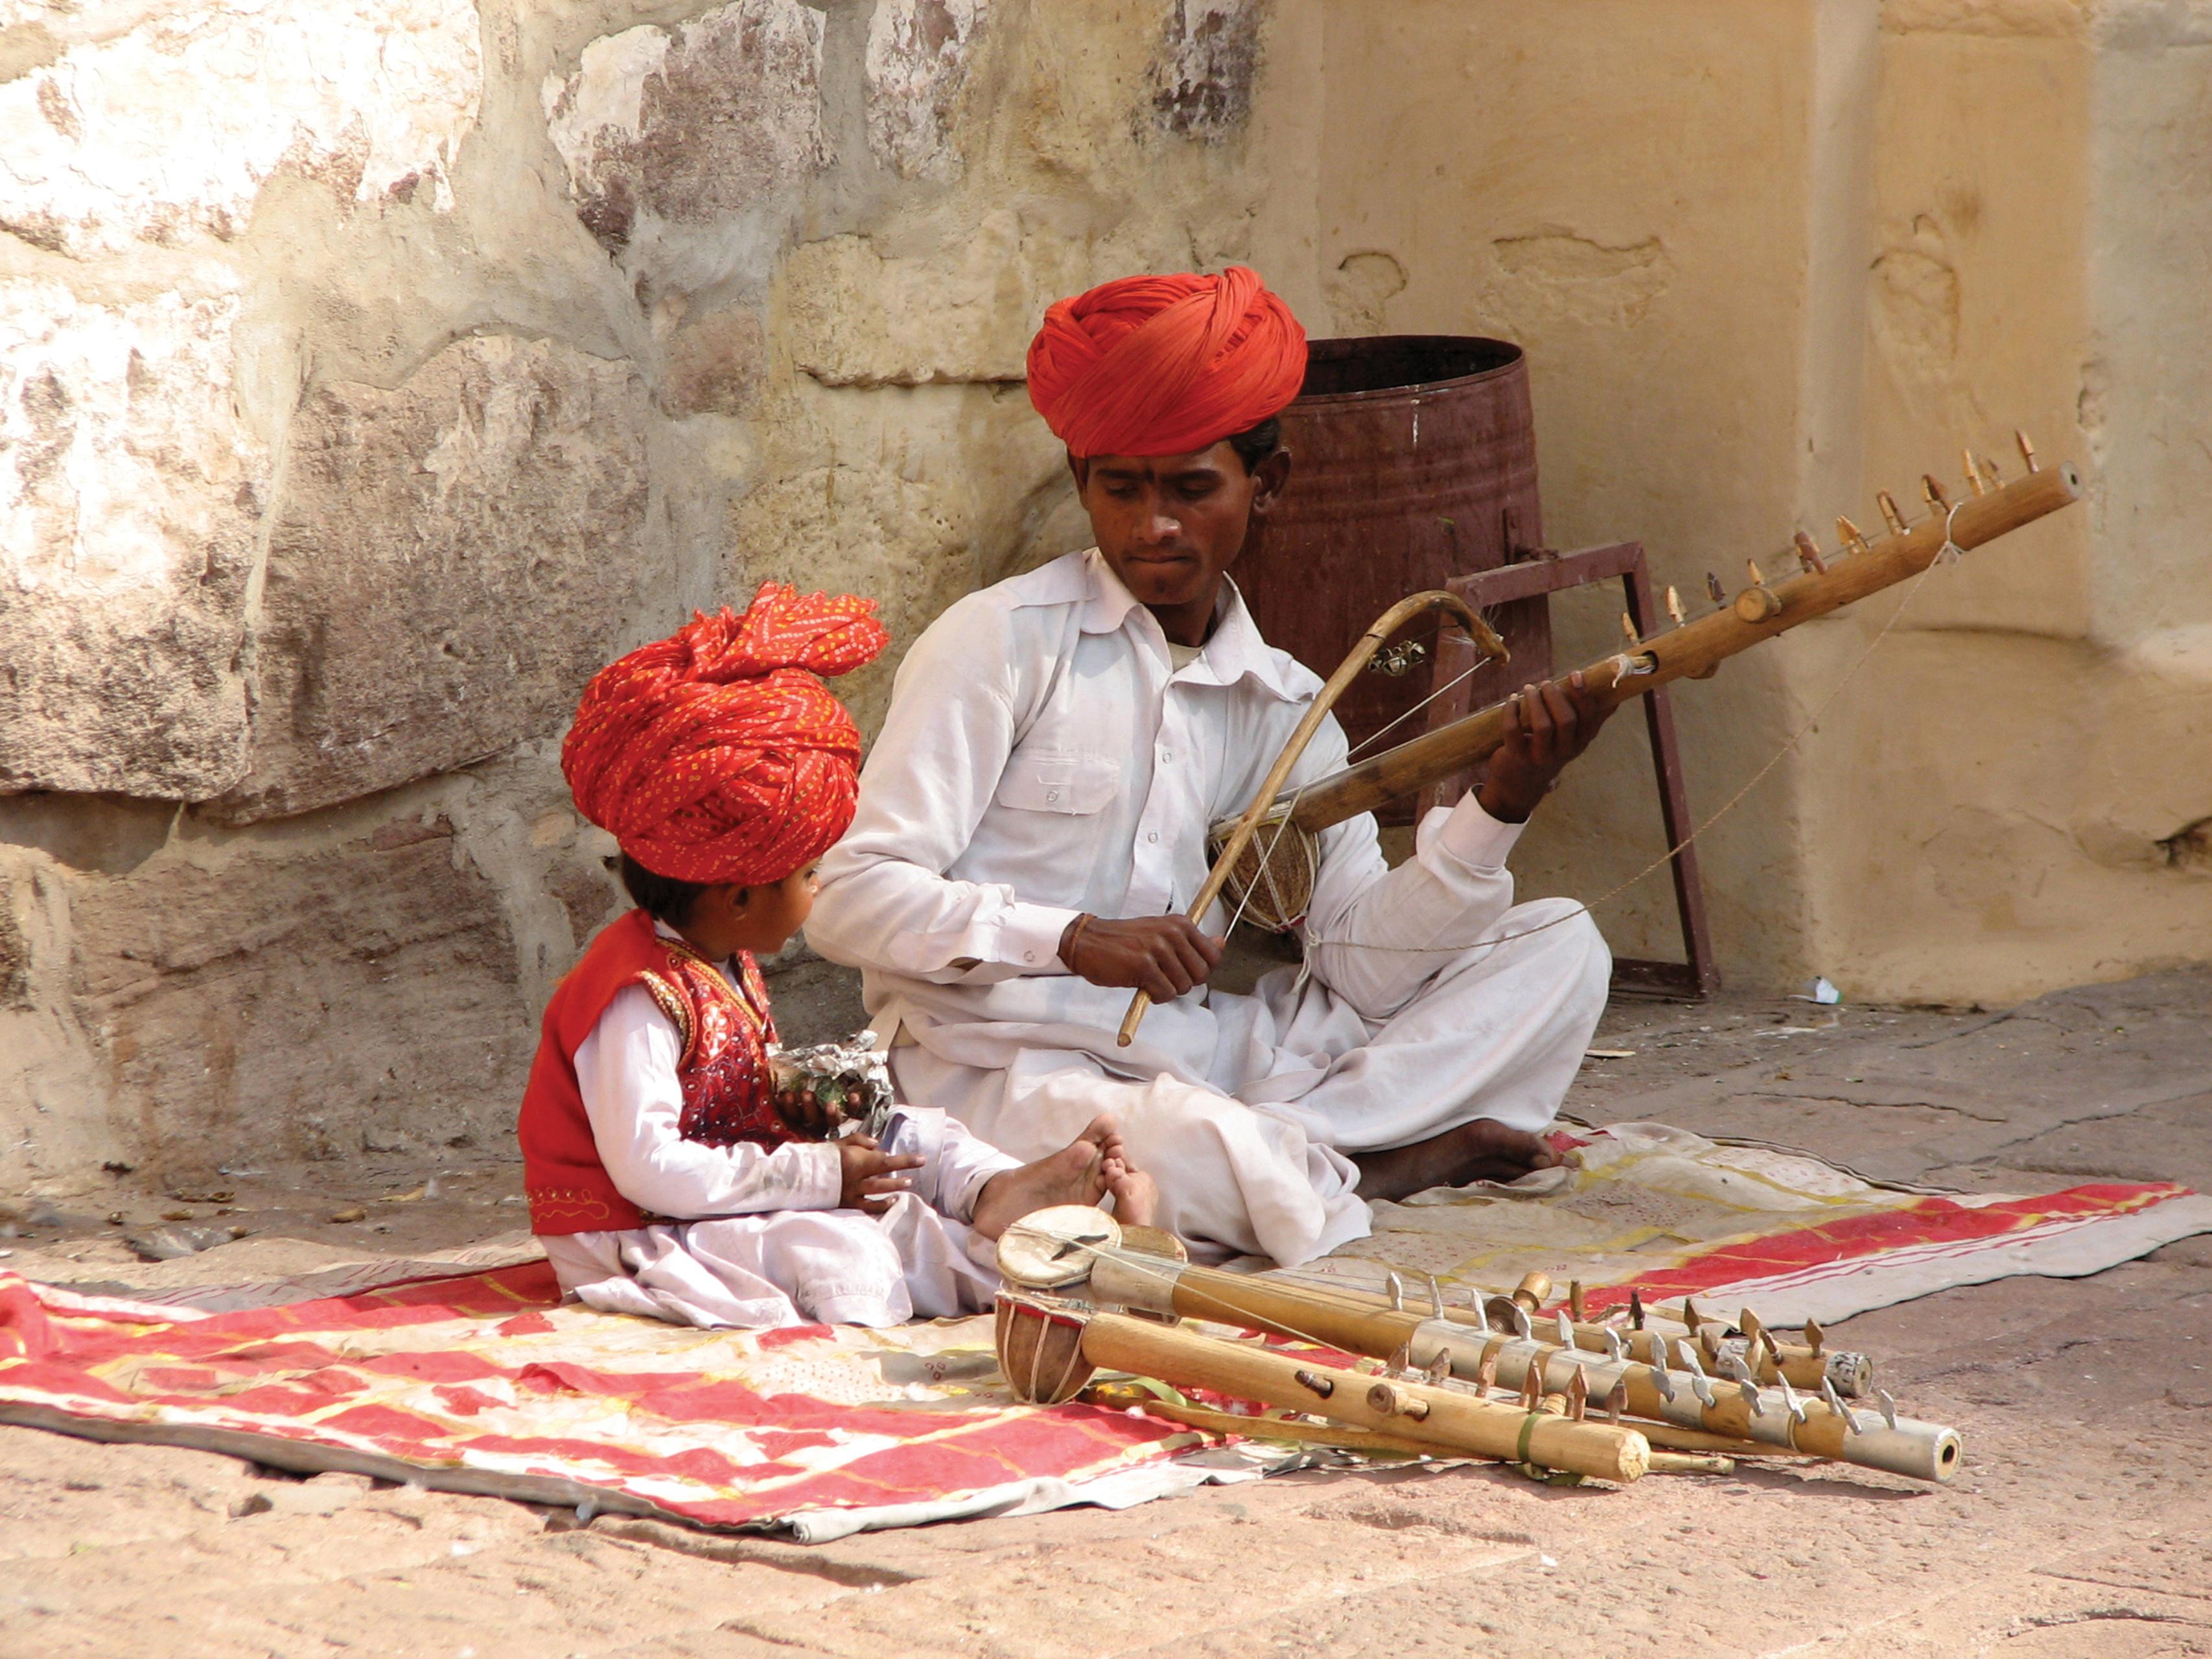 india_music-lessons.jpg